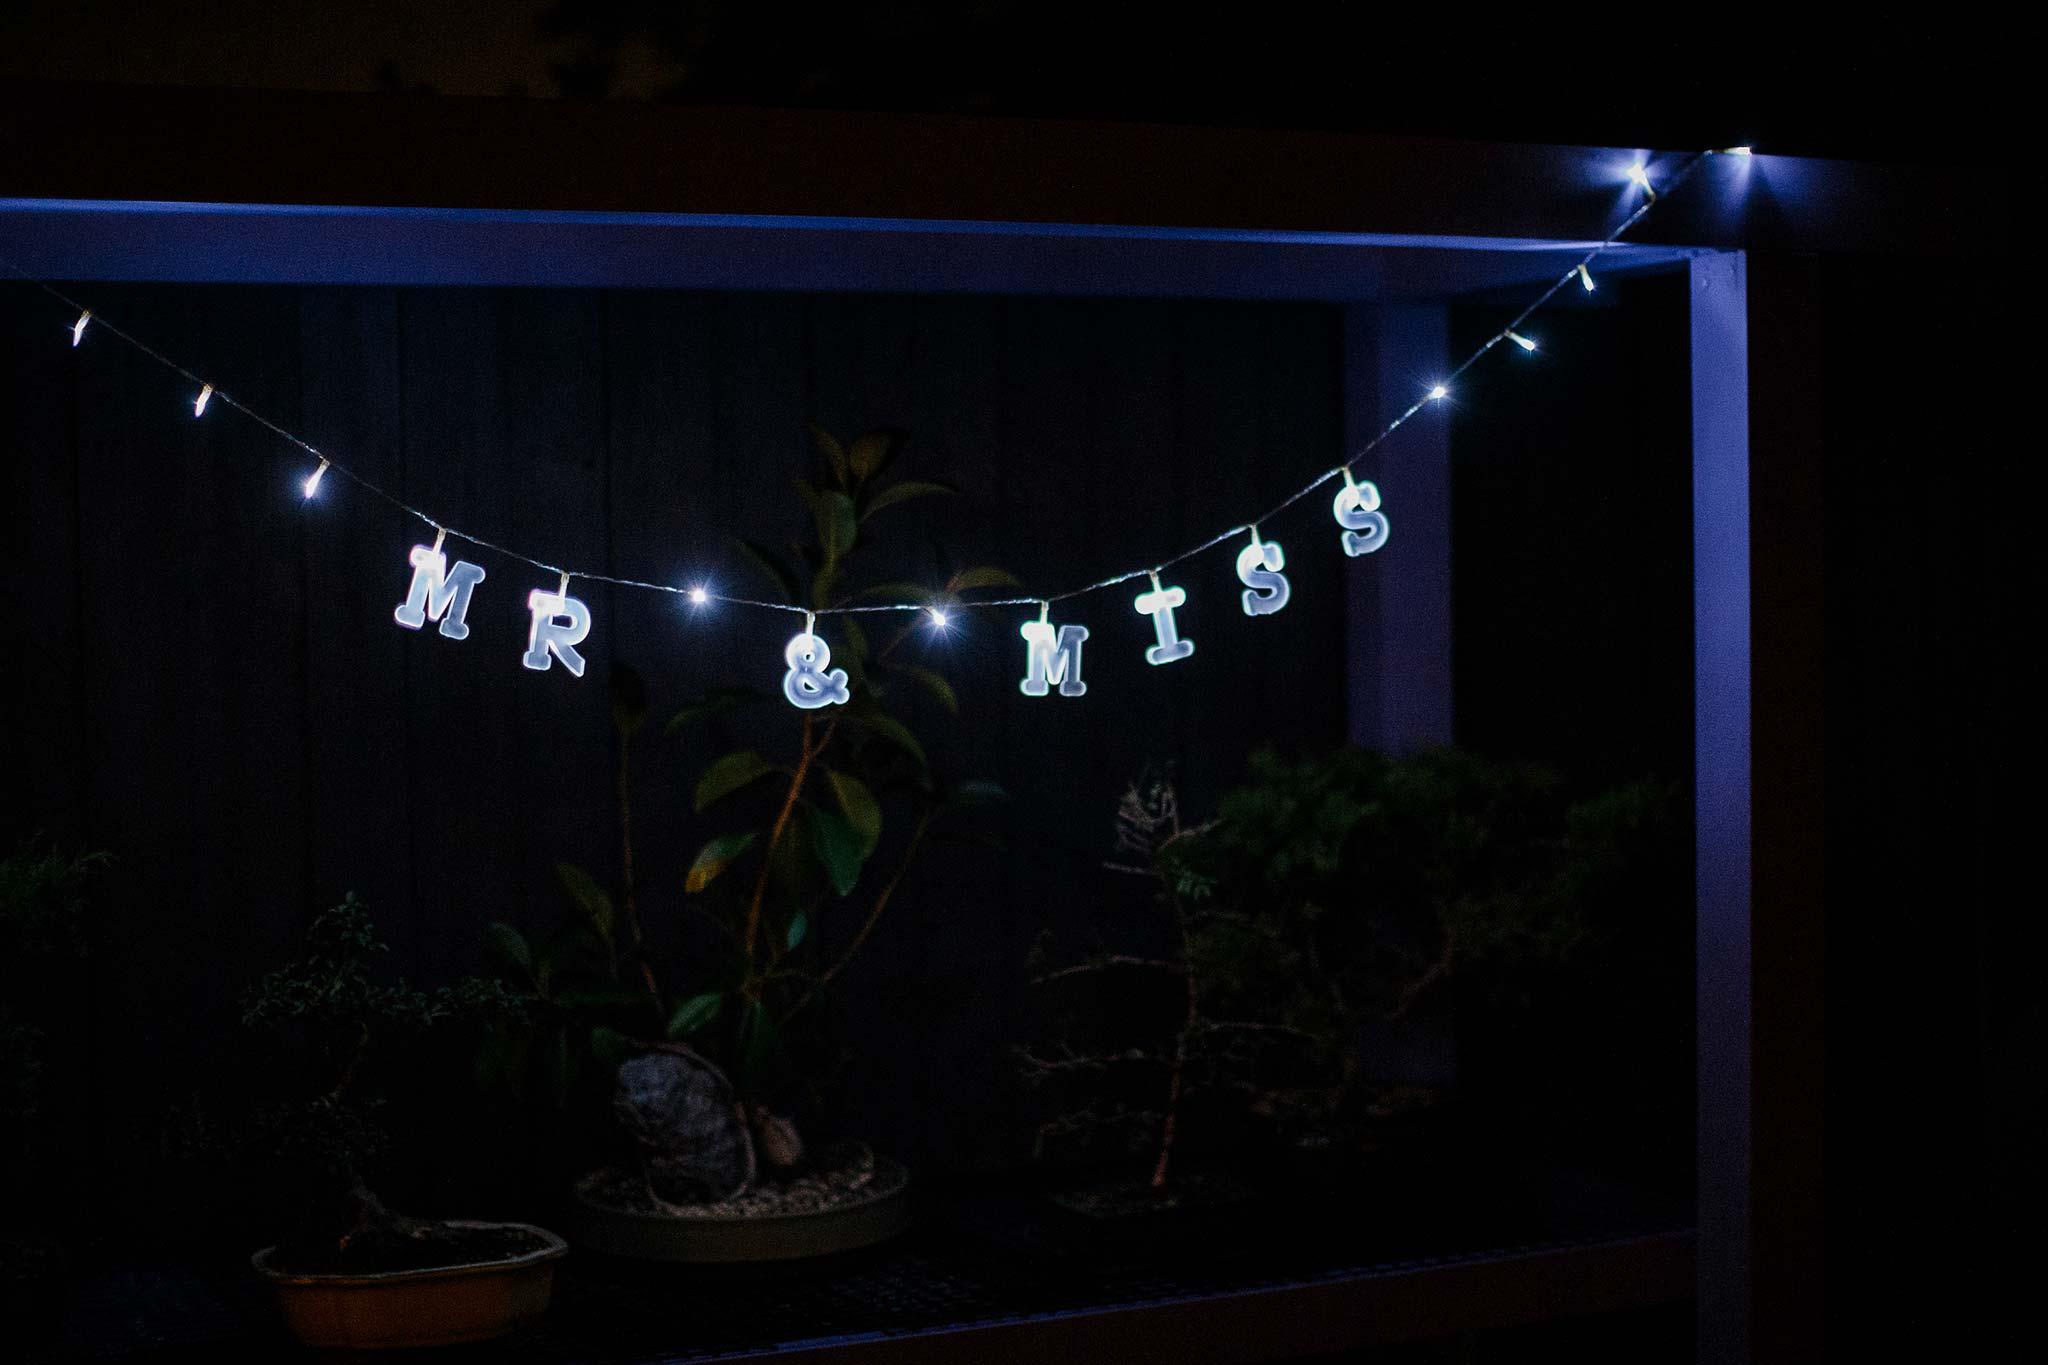 Strathmore-Melbourne-Backyard-Wedding-reception-light-decoration-mr-mrs